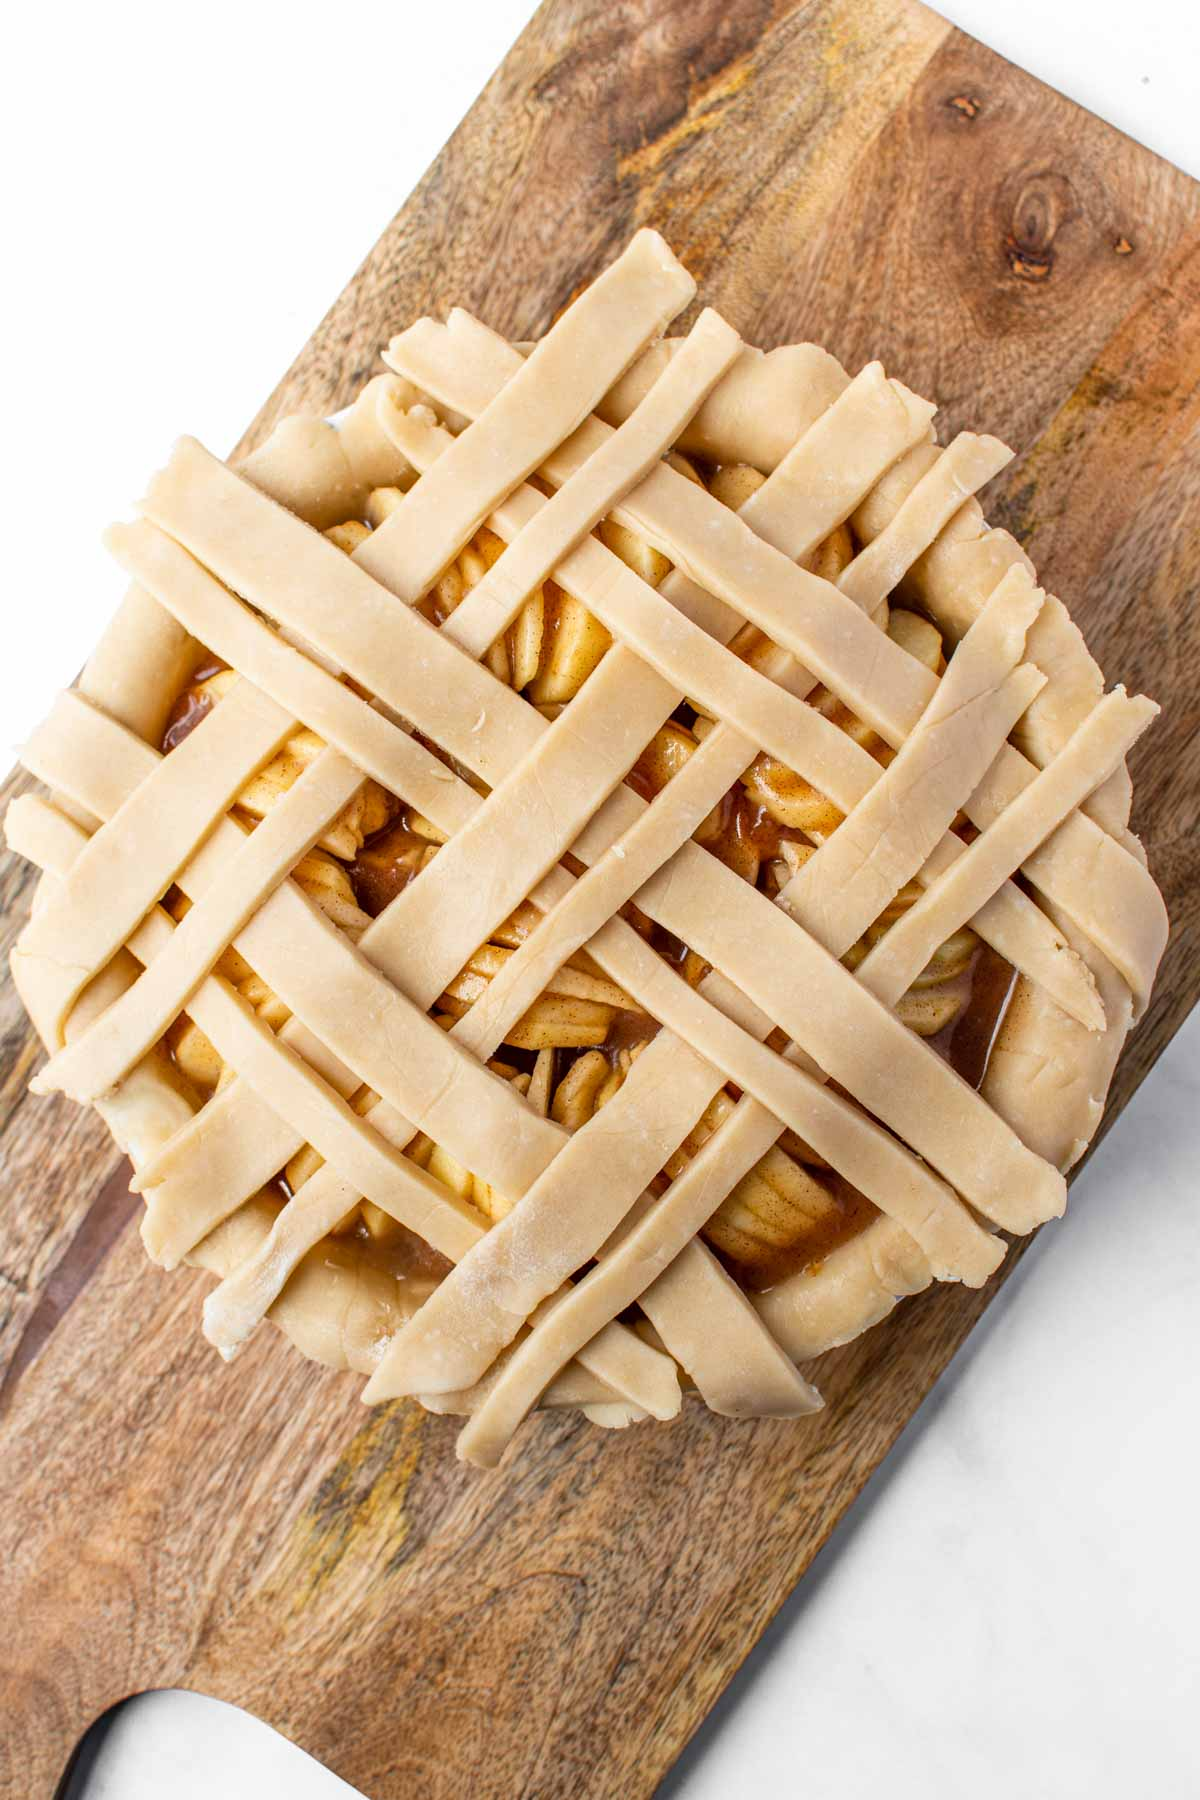 Pie with flaky pie crust strips on top